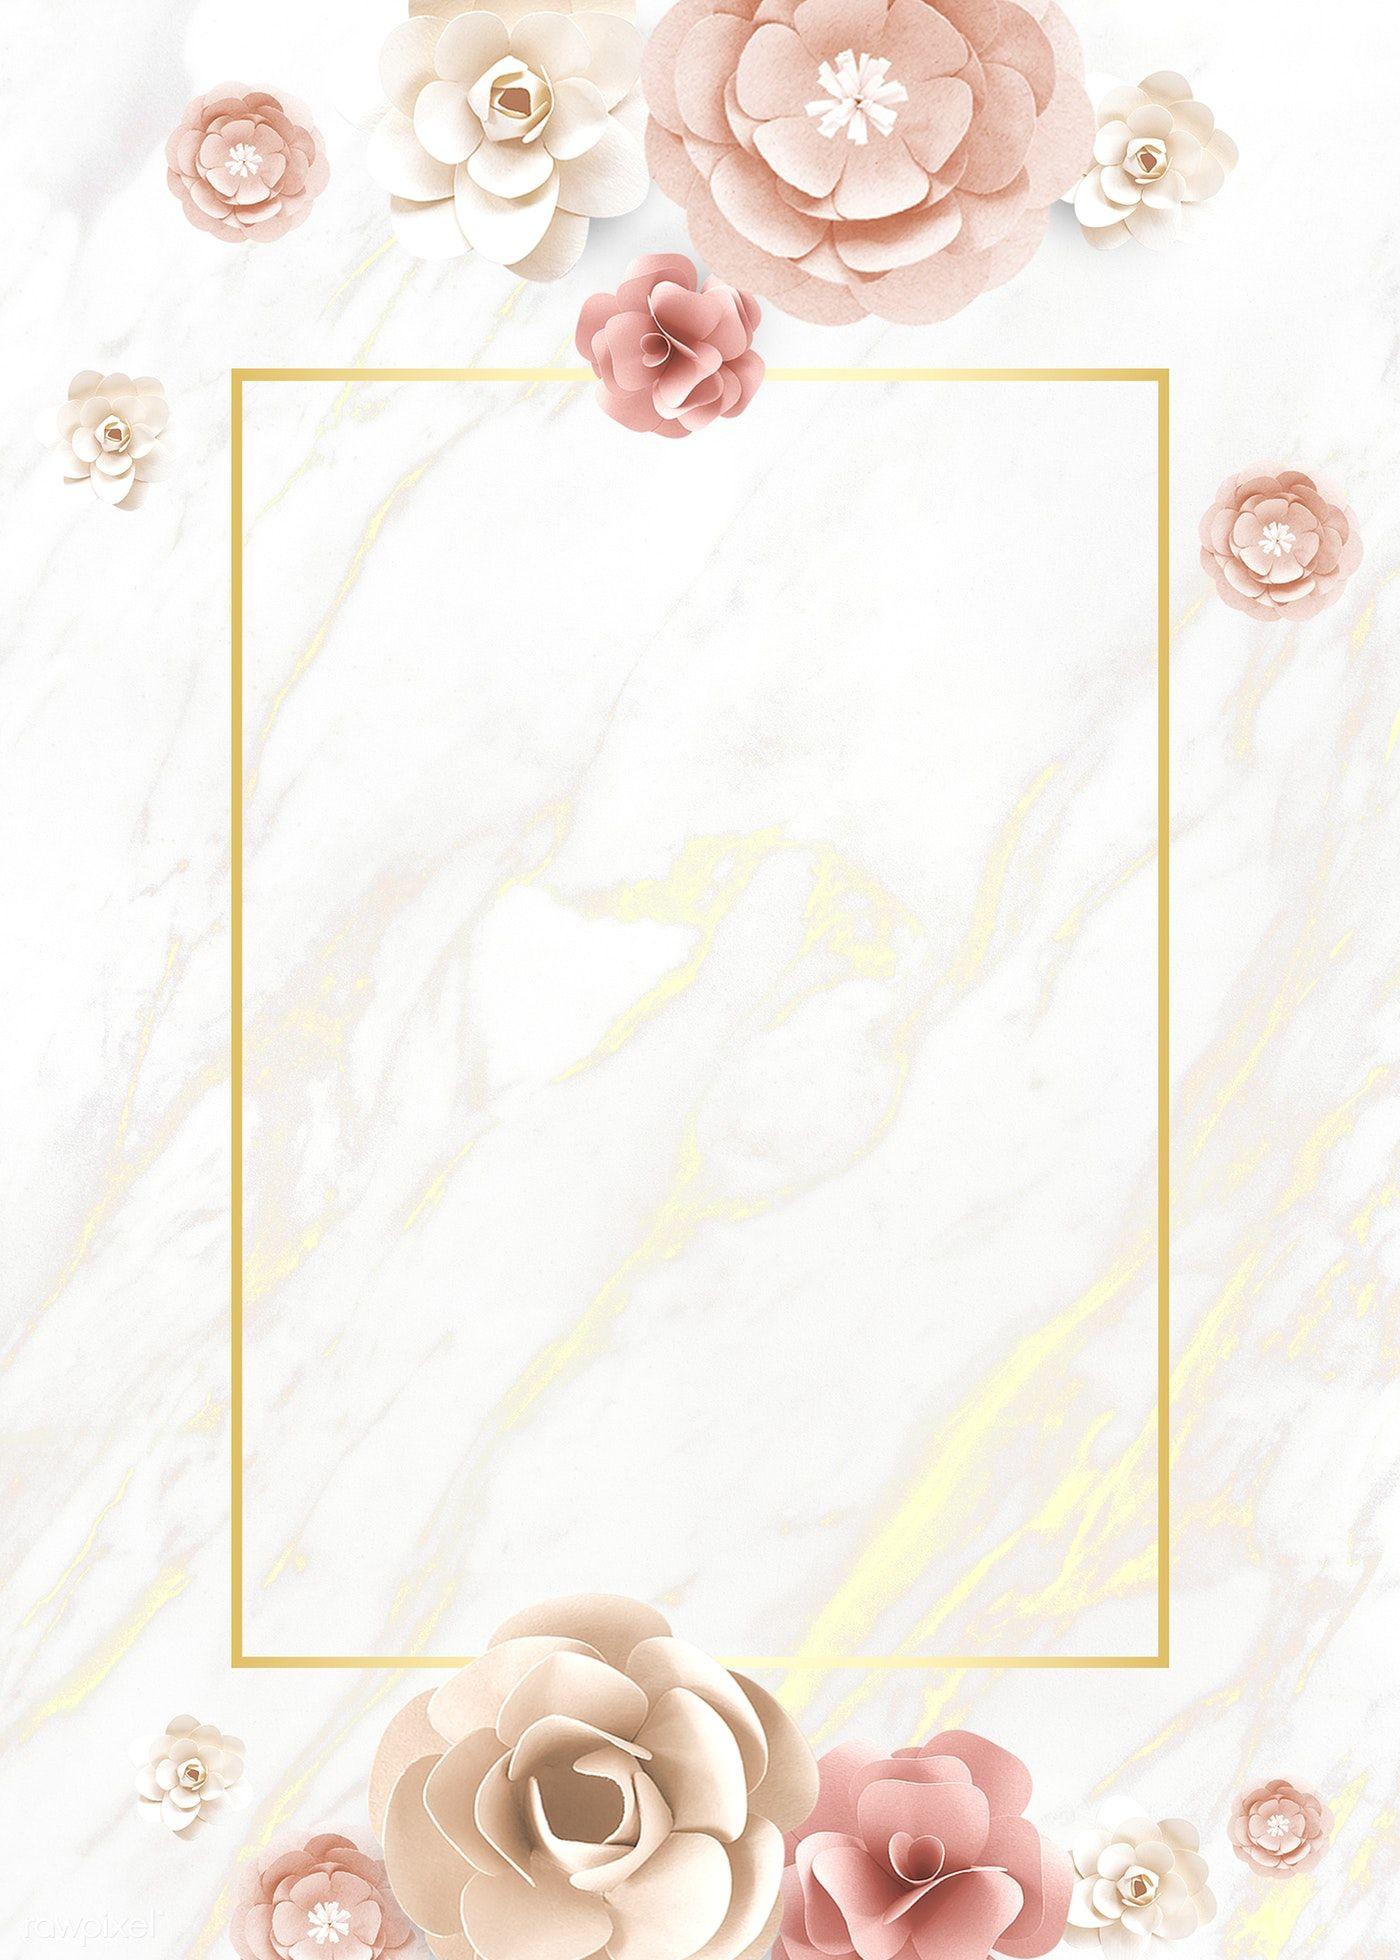 Download Premium Illustration Of Paper Craft Flower Element Card